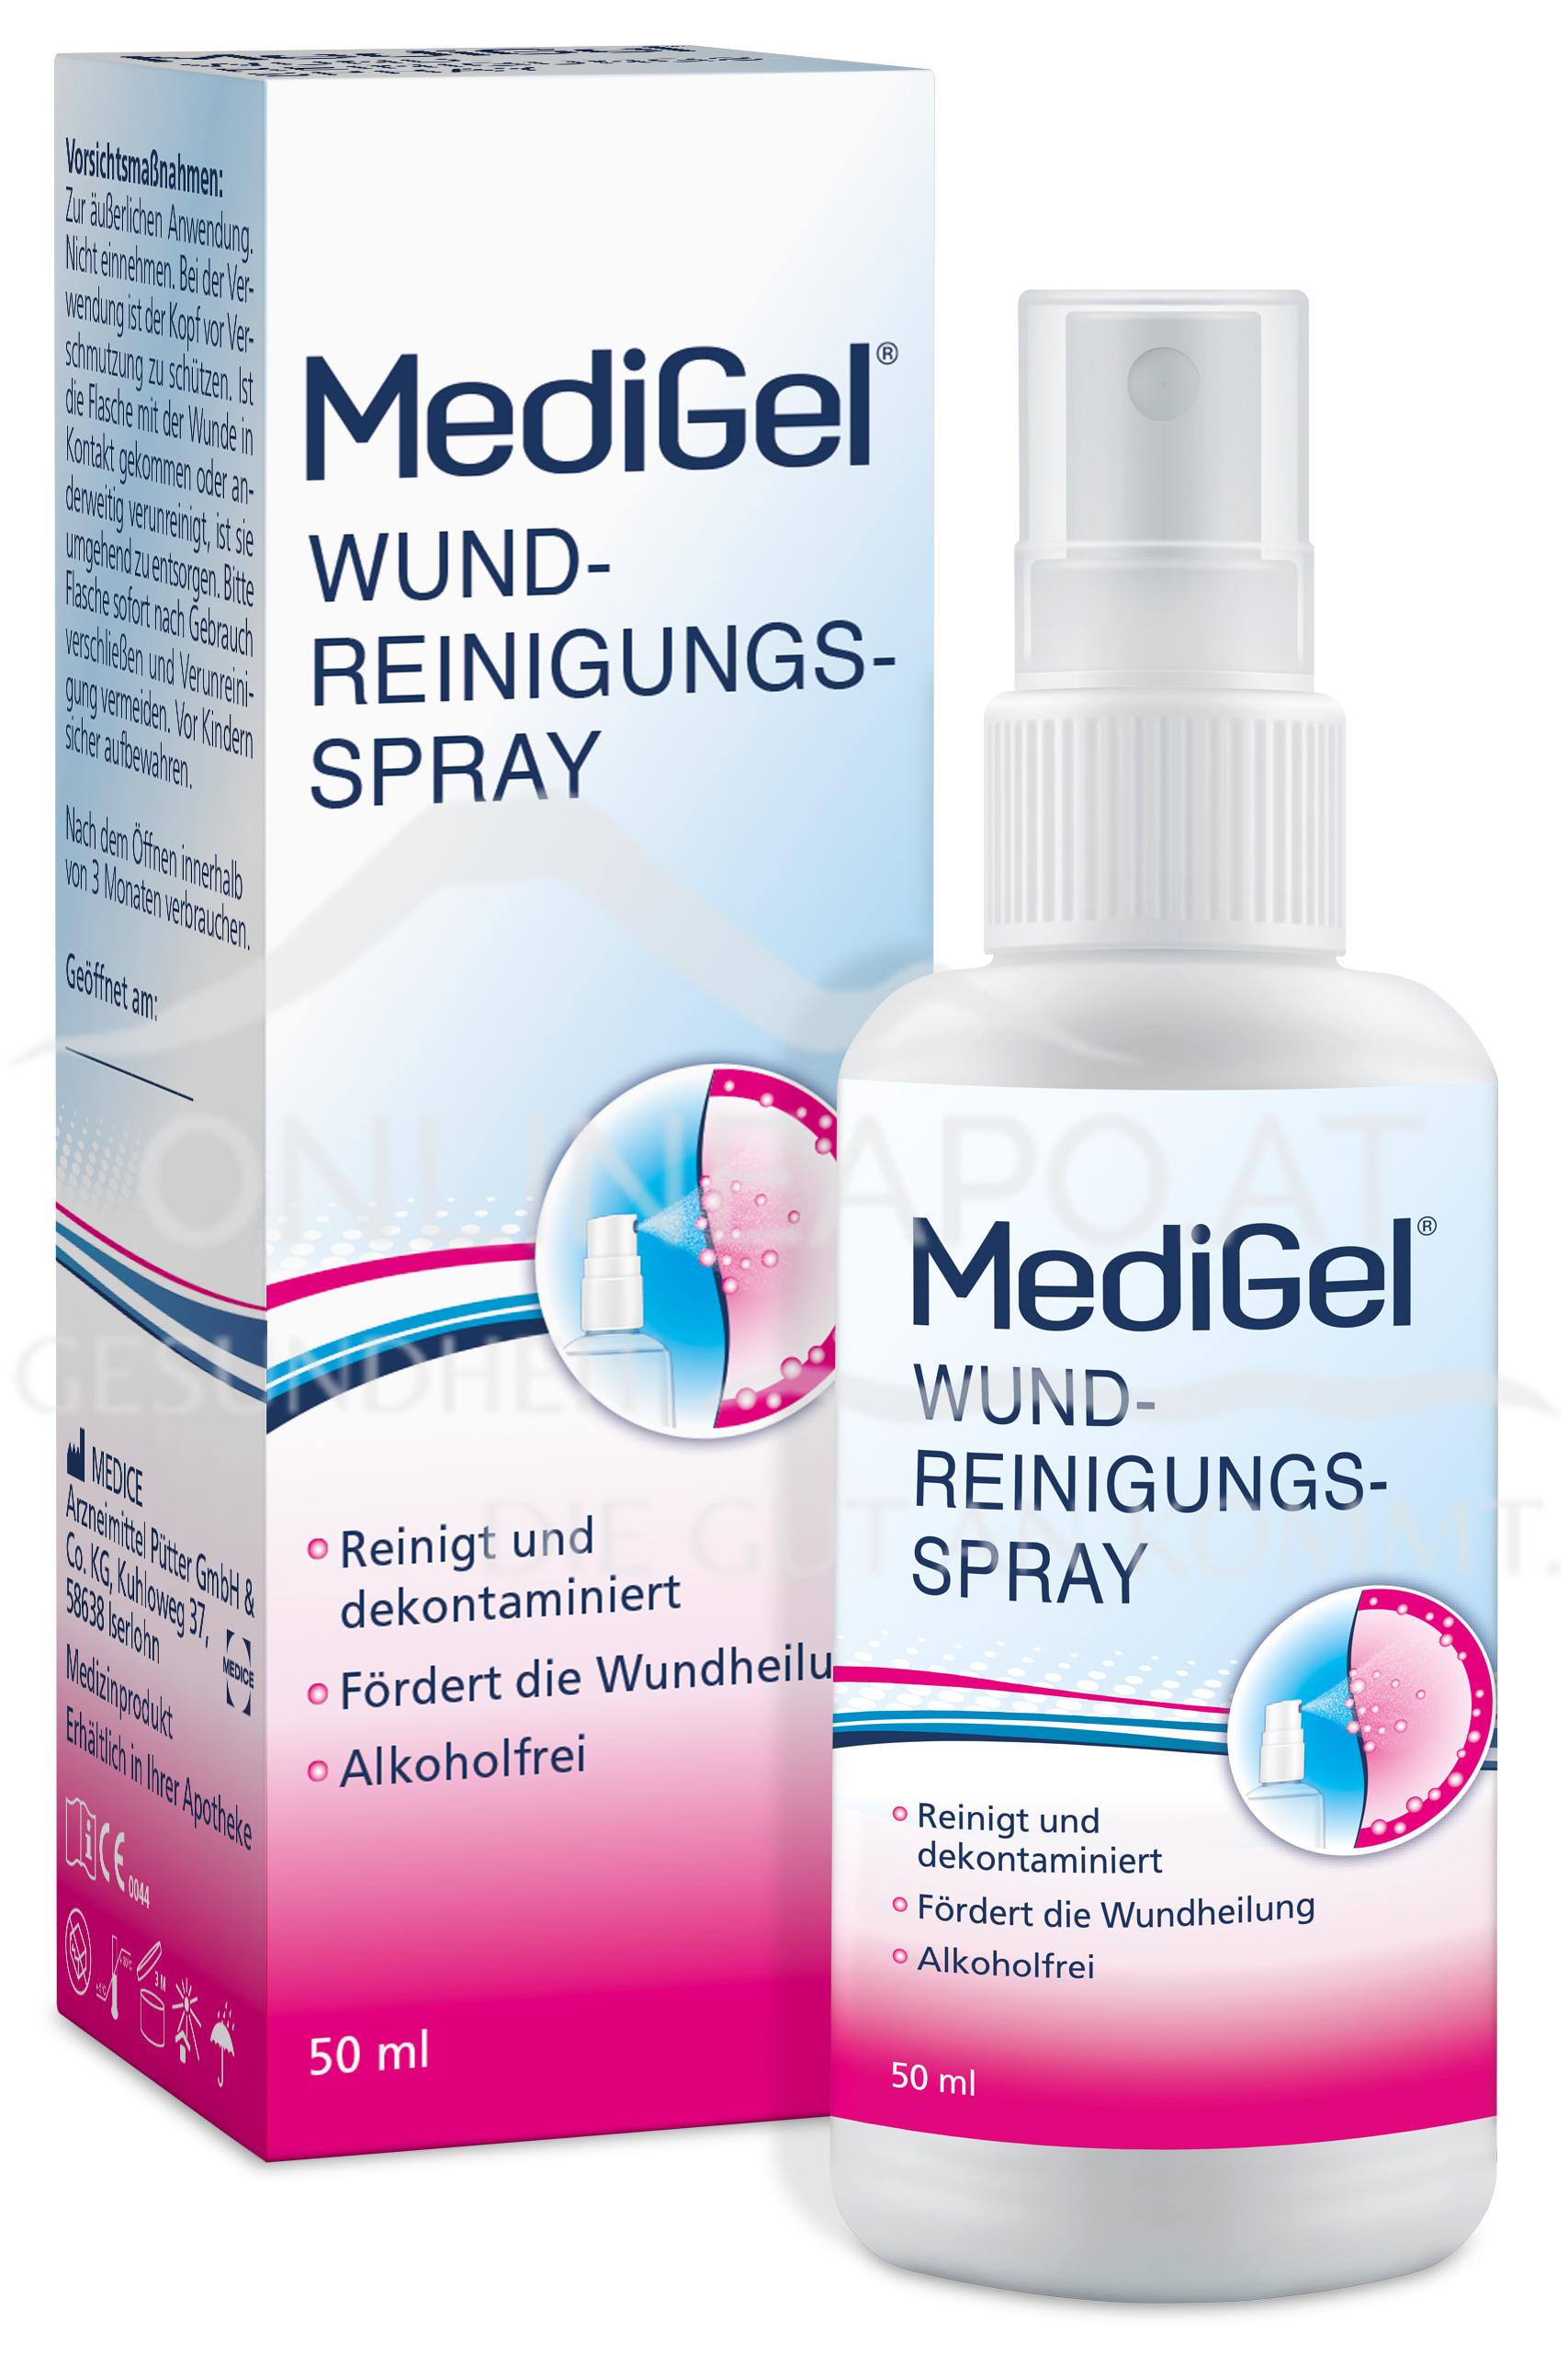 MediGel® Wundreinigungsspray